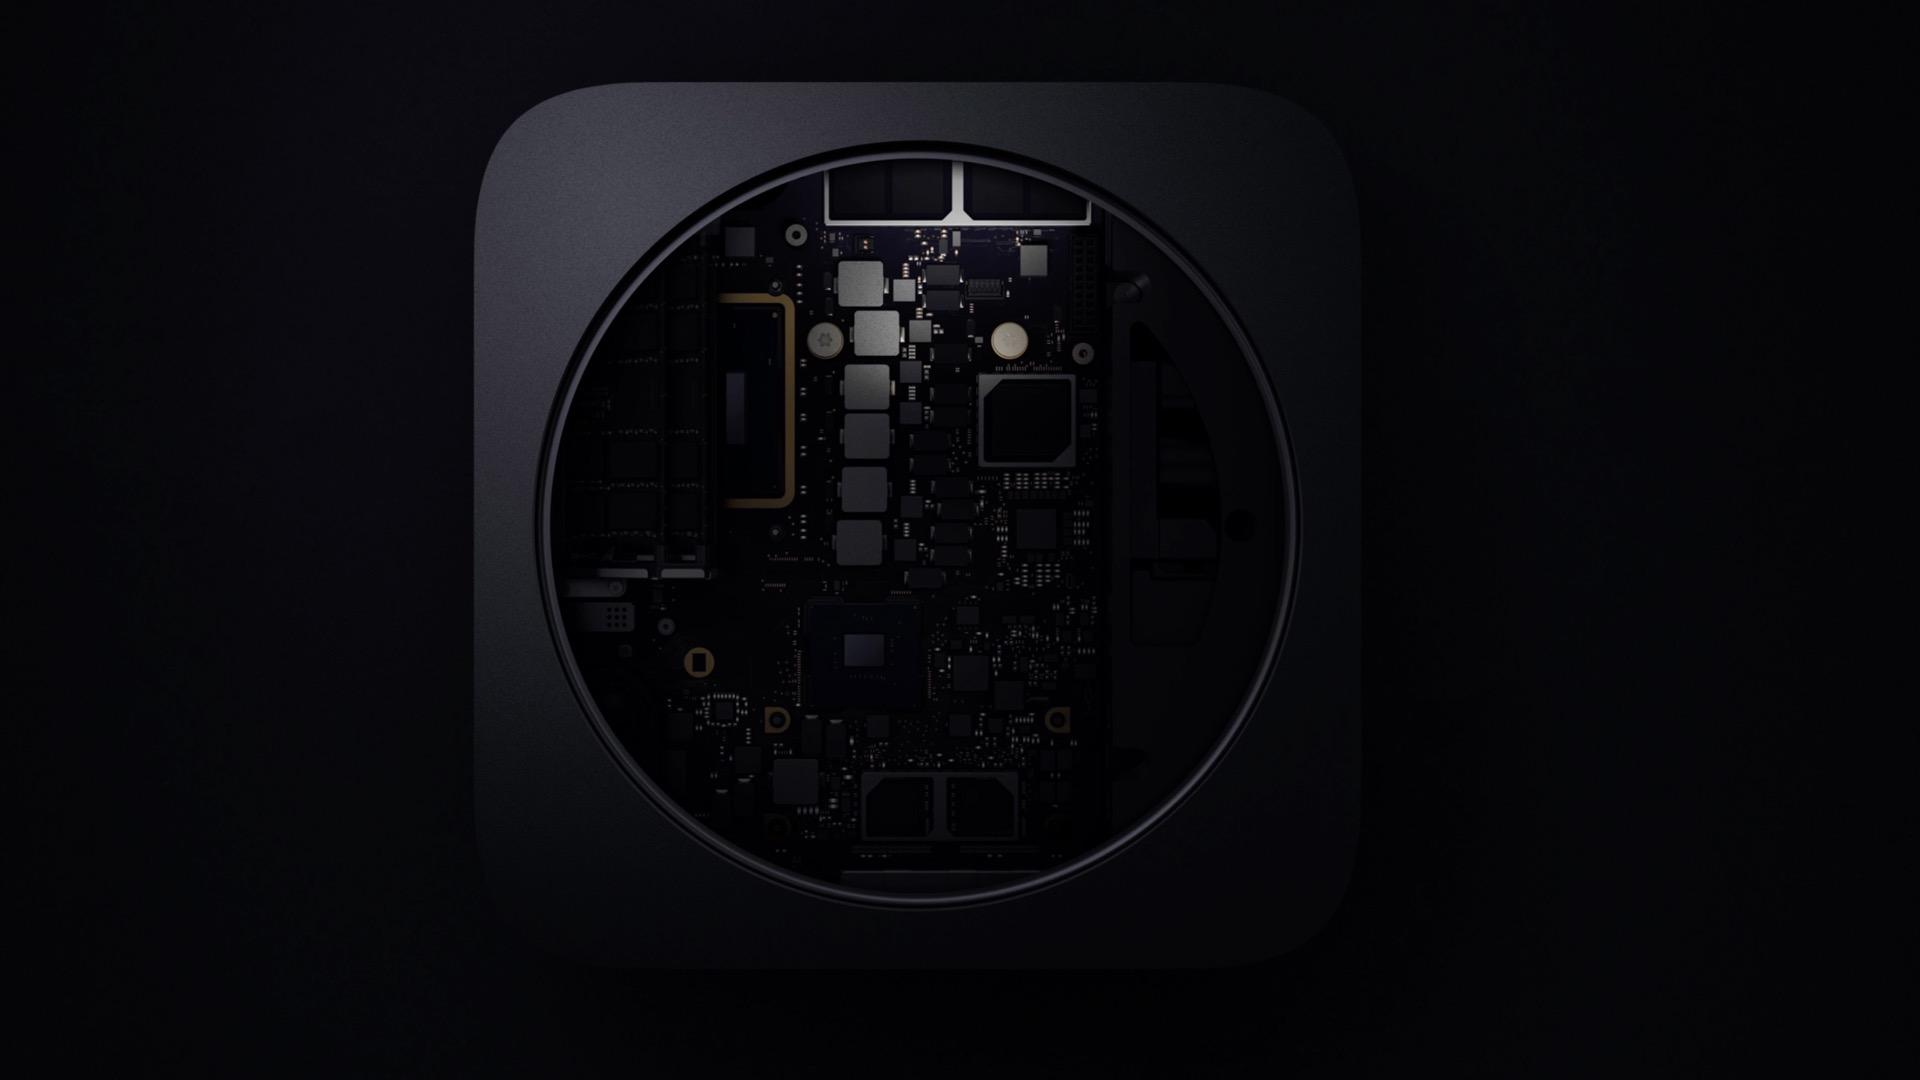 Mac mini 2018 review: Apple's most versatile new Mac [Video